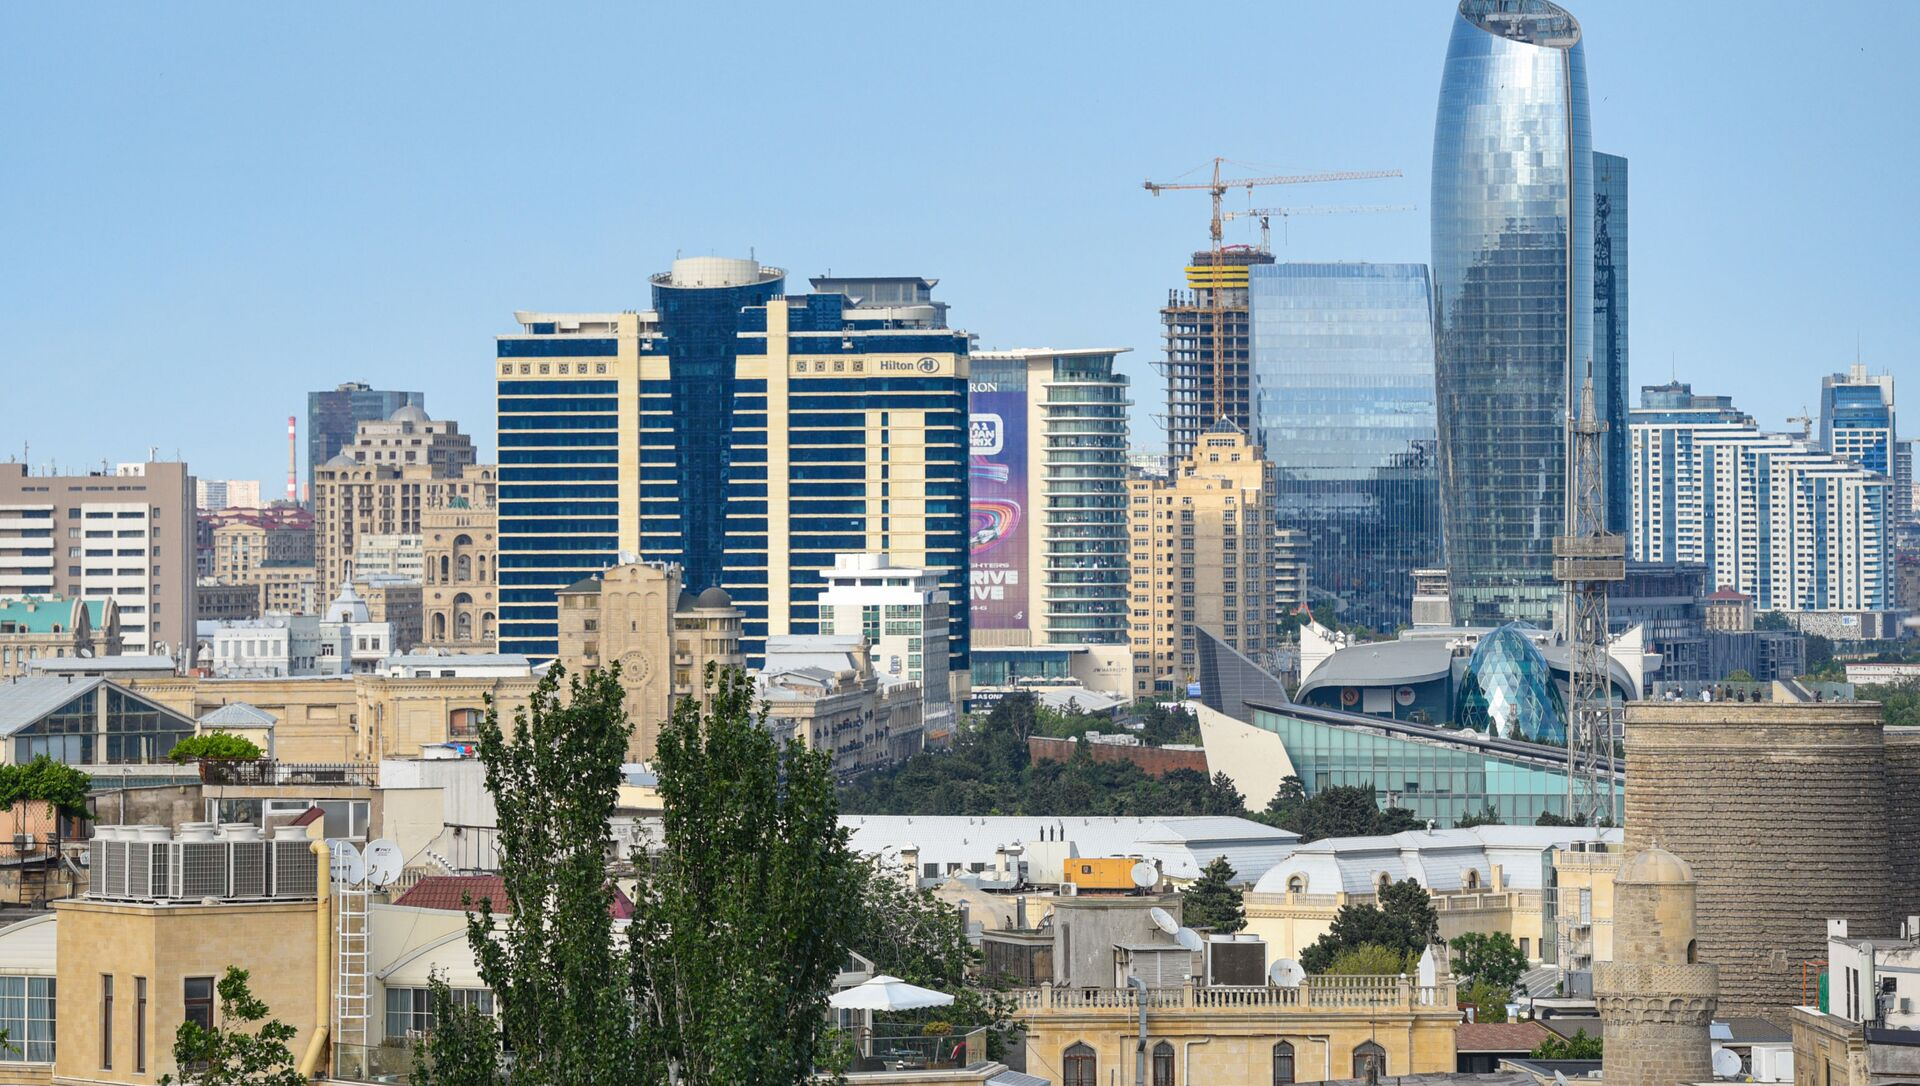 Вид на город Баку, фото из архива - Sputnik Azərbaycan, 1920, 28.08.2021